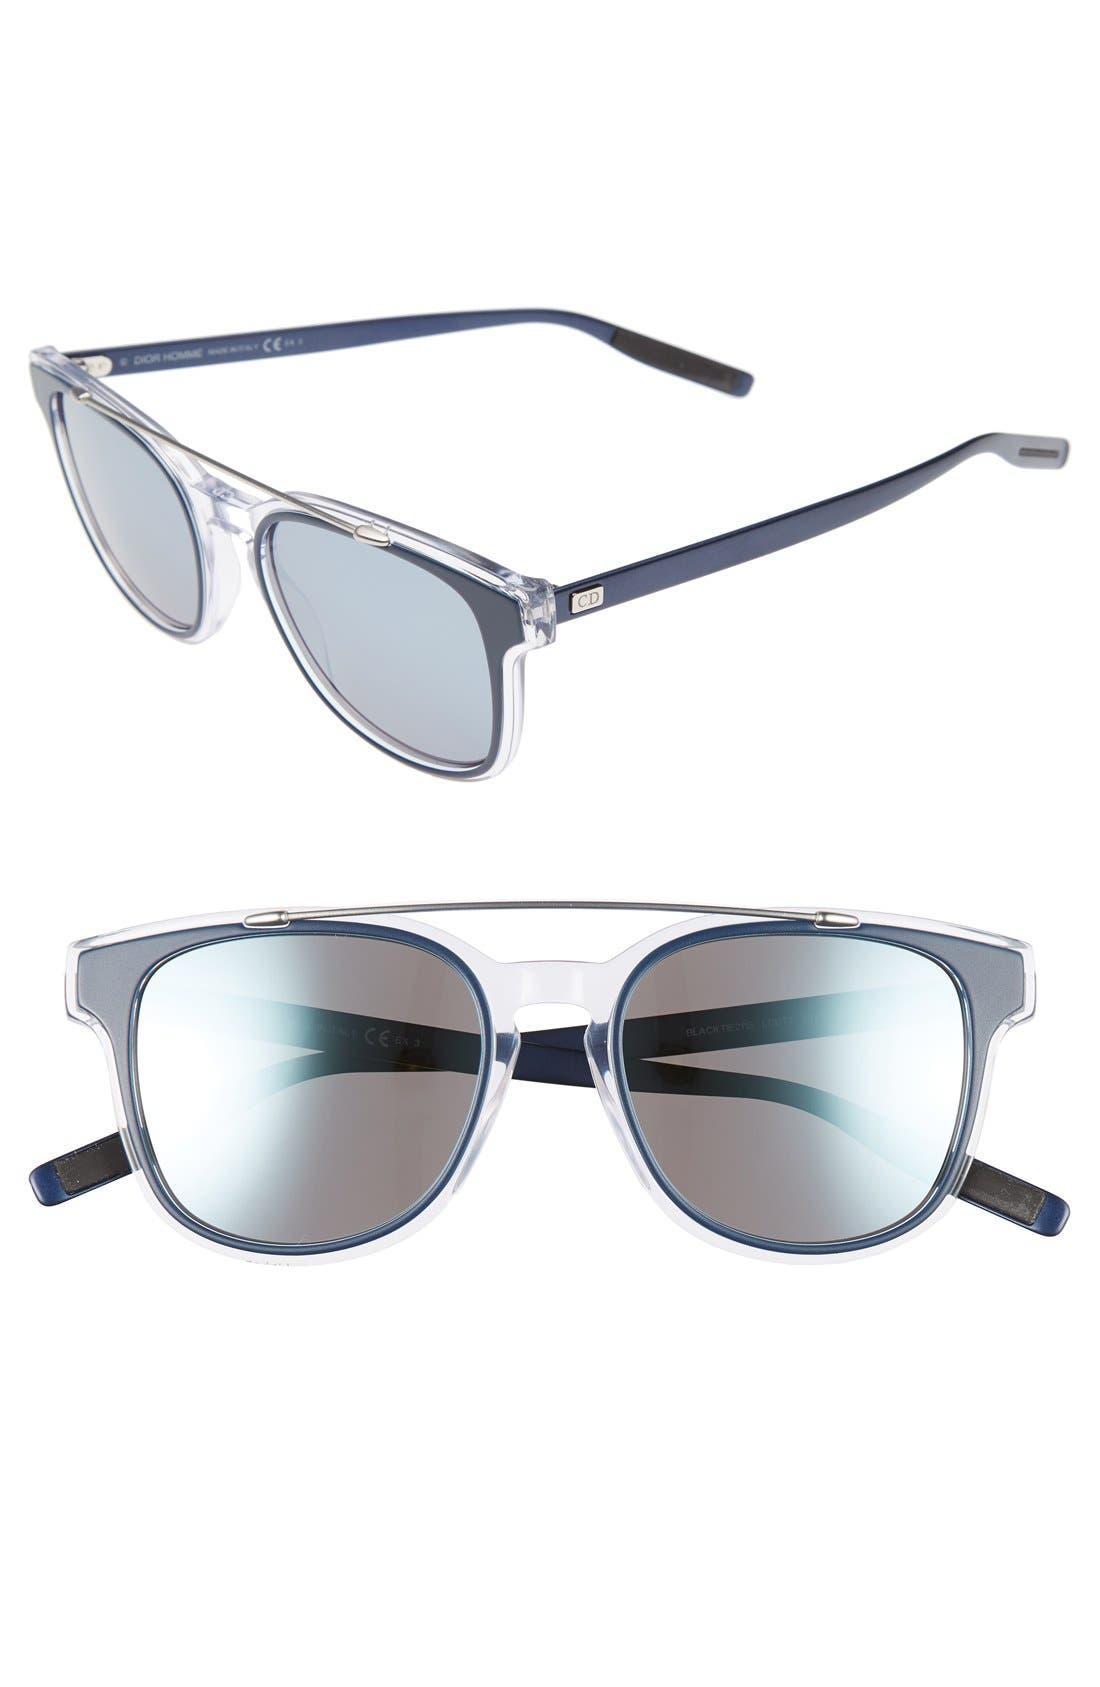 DIOR HOMME 'Black Tie' 52Mm Sunglasses - Blue Crystal Palladium